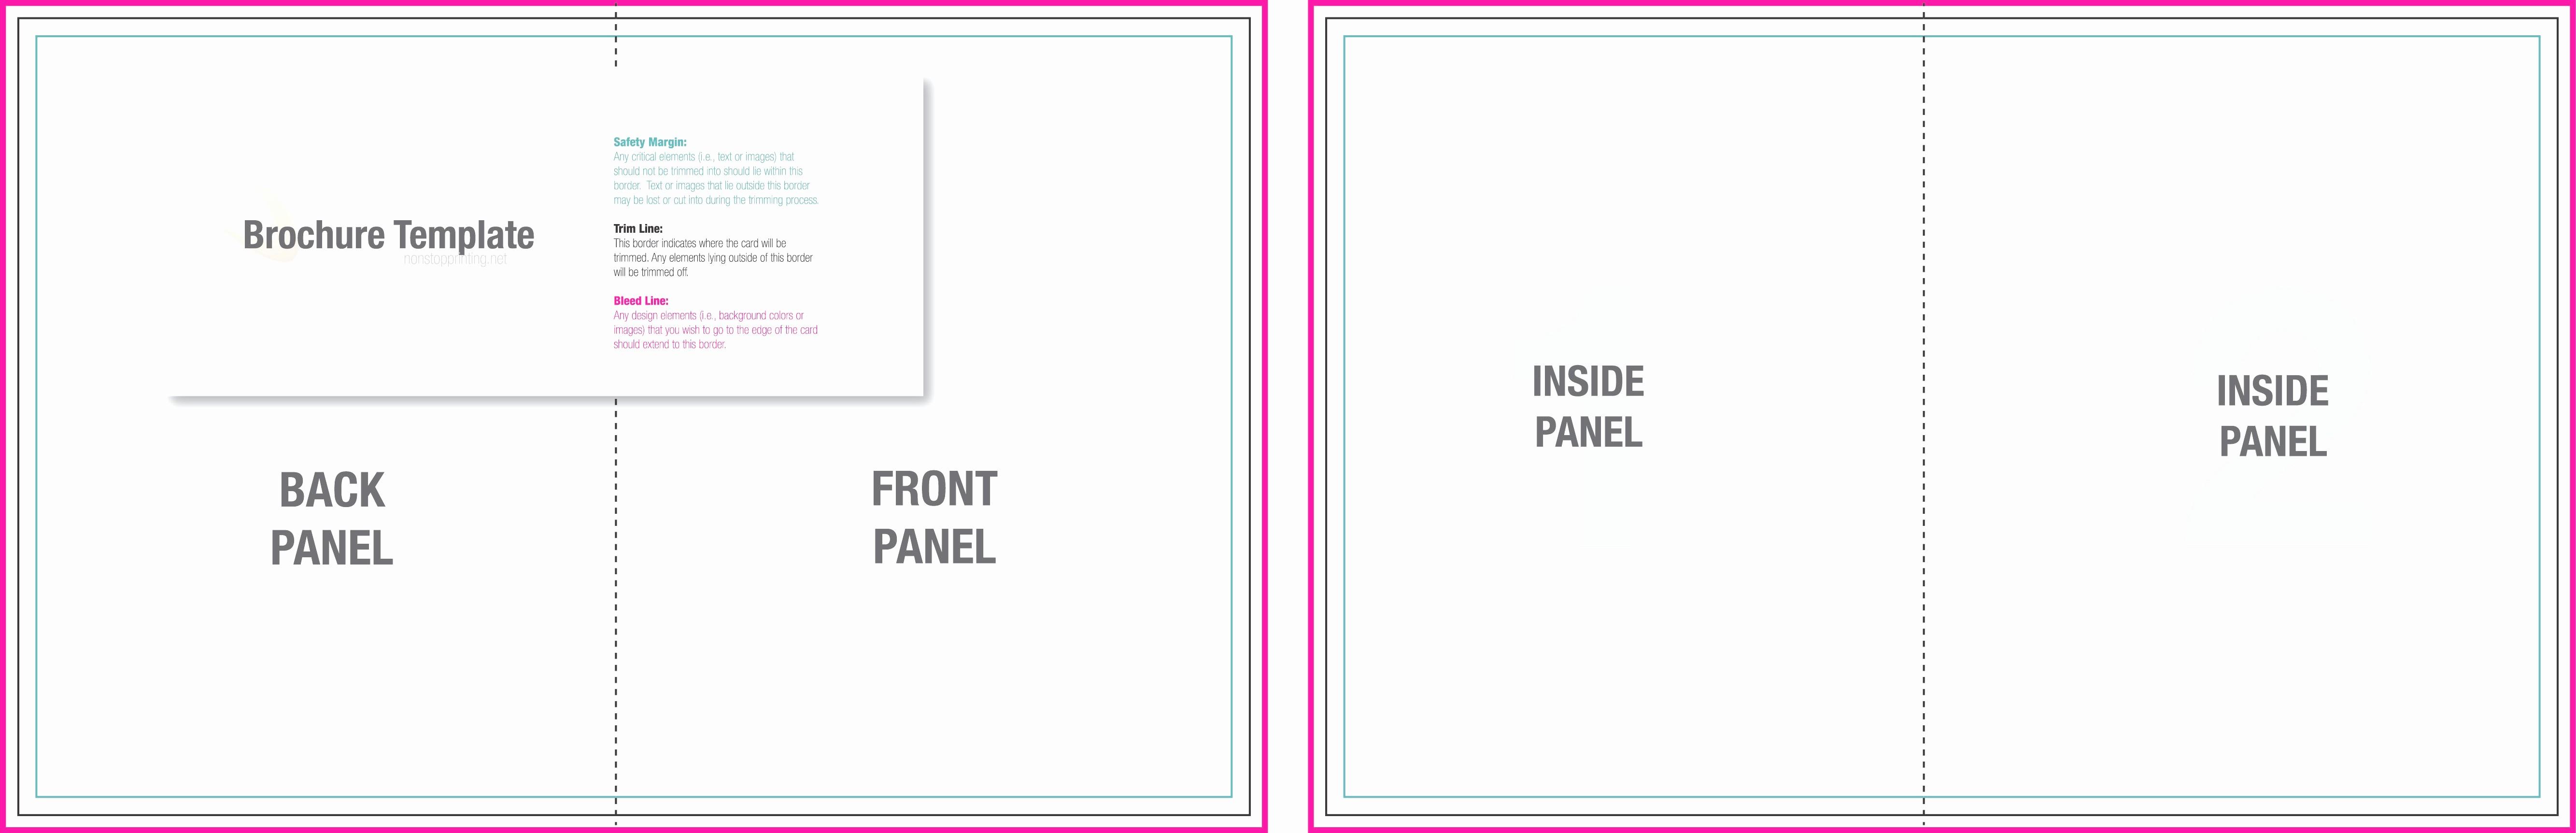 Bi-fold Brochure Template Luxury Bi Fold Brochure Template Word Mughals